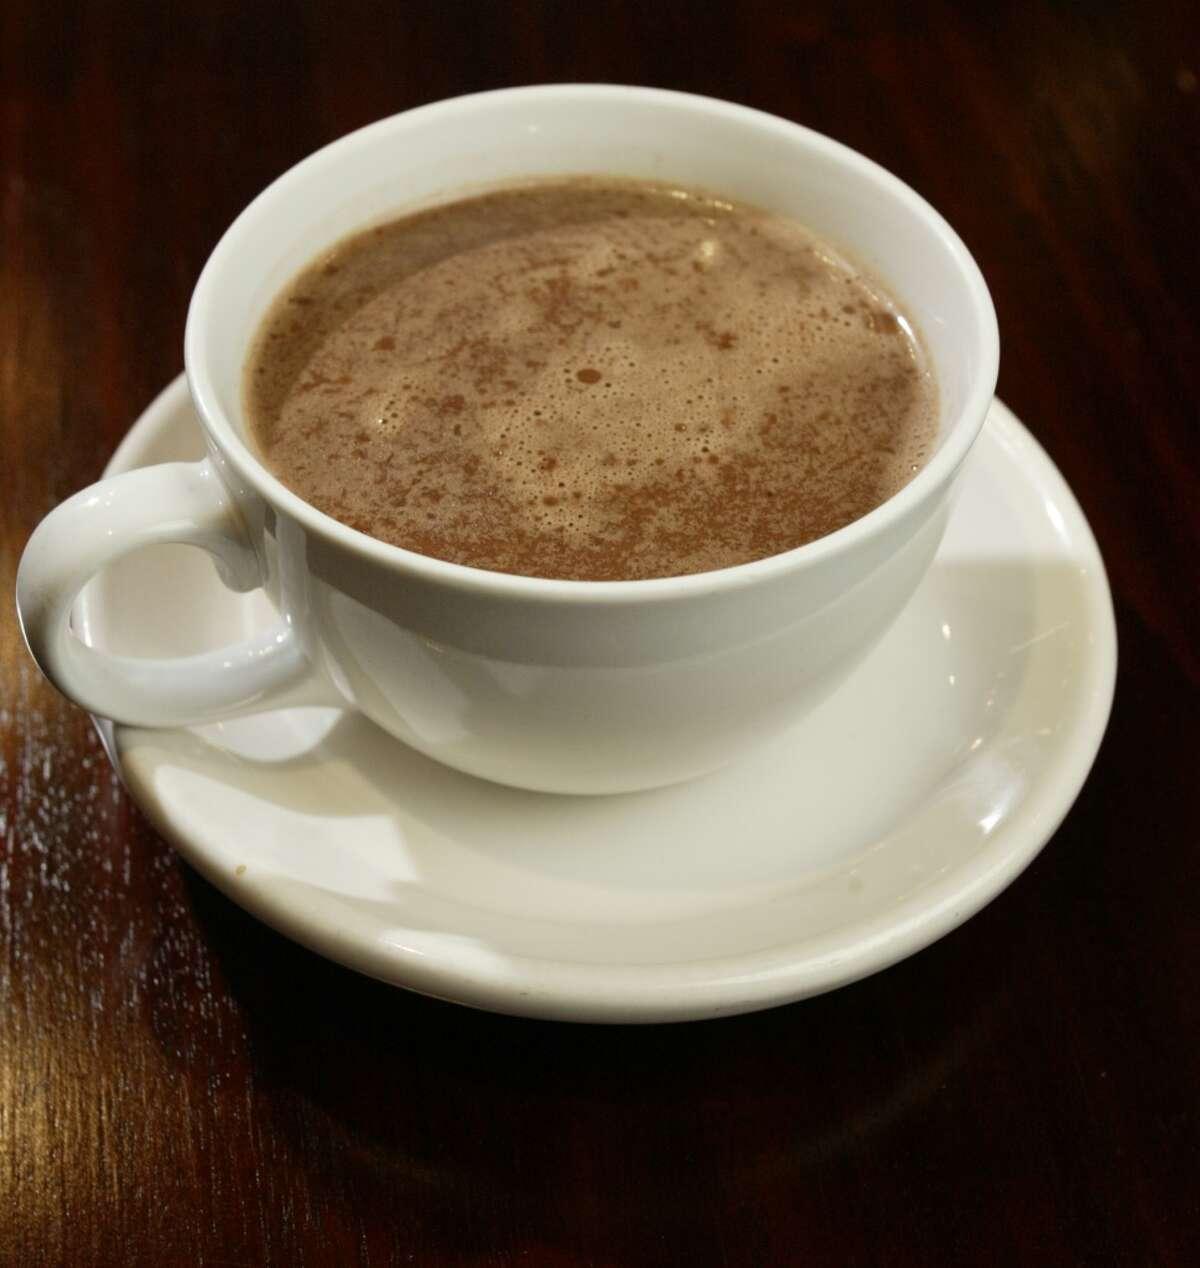 Rumors European Cafe, Danbury Buy one coffee or espresso-based beverage, get one 50 percent off on Sept. 29.